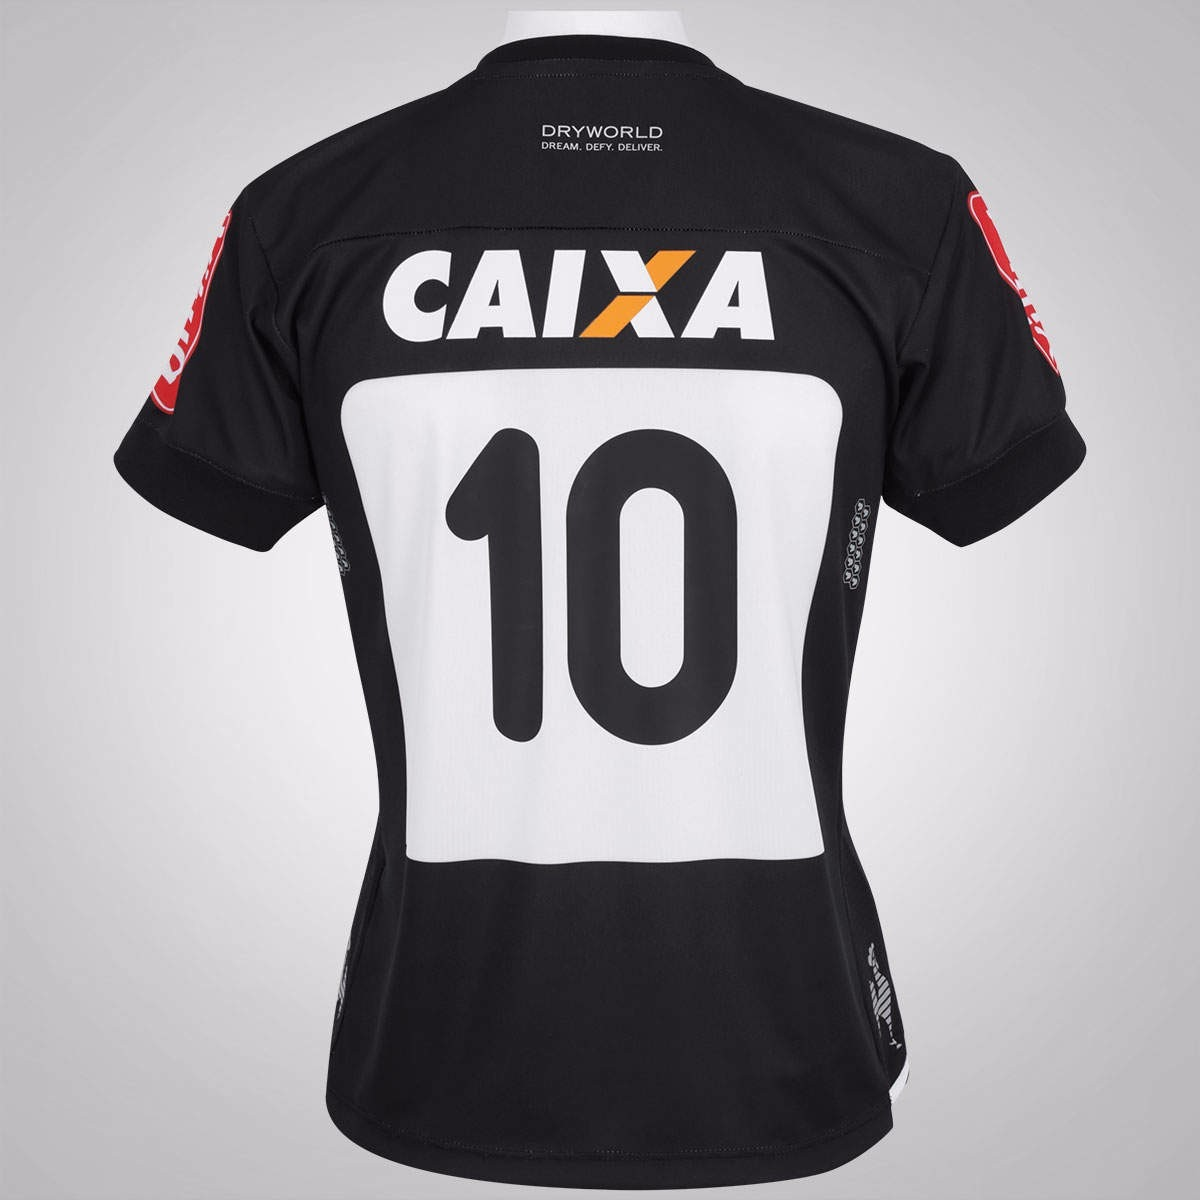 eec8deeee Camisa Dryworld Atlético Mineiro I 2016 Original Nº 10 - R  169